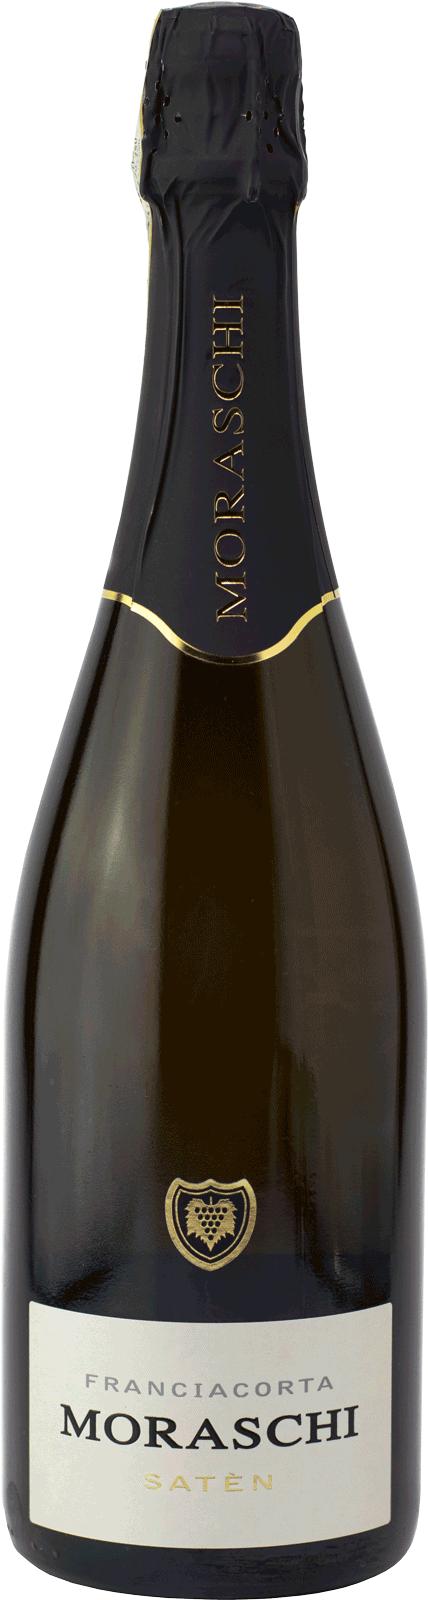 moraschi franciacorta vini saten spumante